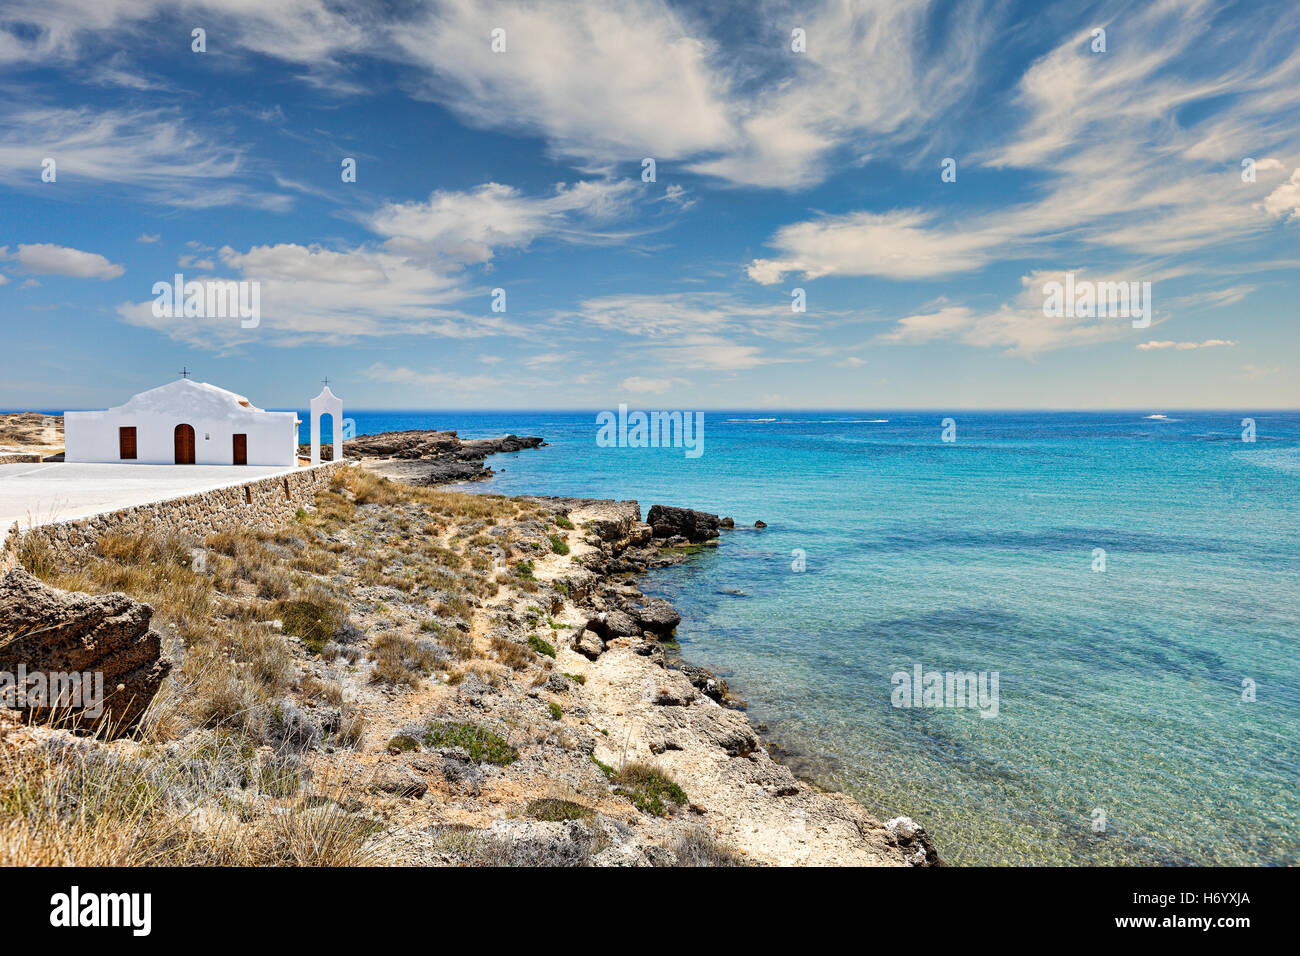 Agios Nikolaos in Zakynthos island, Greece - Stock Image